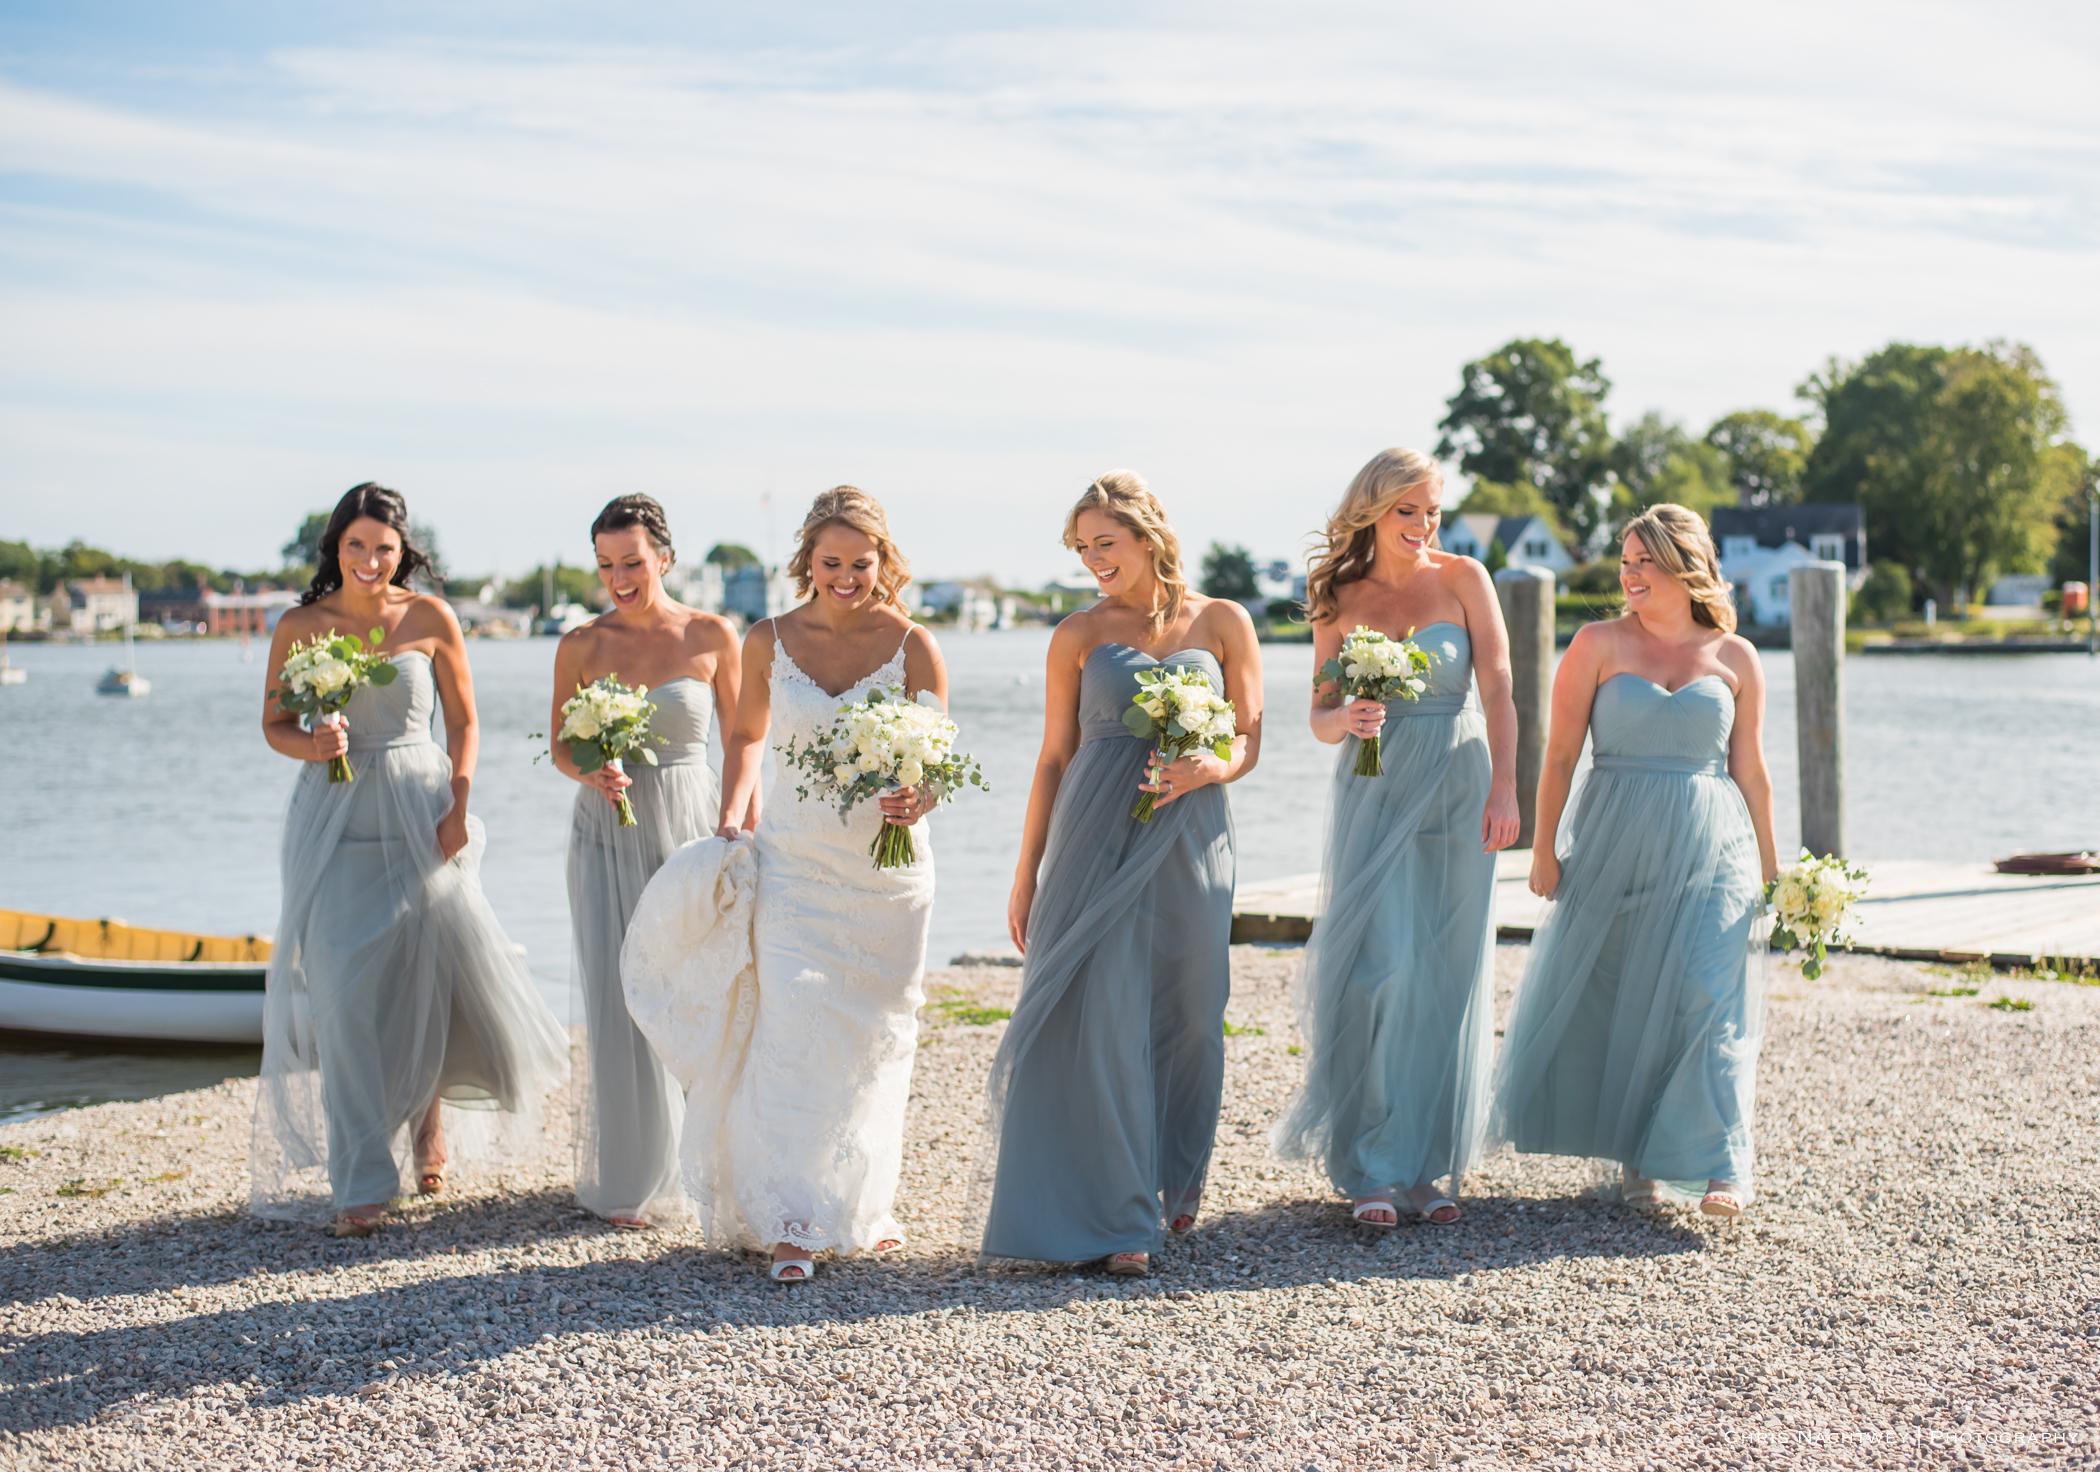 mystic-ct-artistic-wedding-photographers-chris-nachtwey-tany-mike-2017-14.jpg